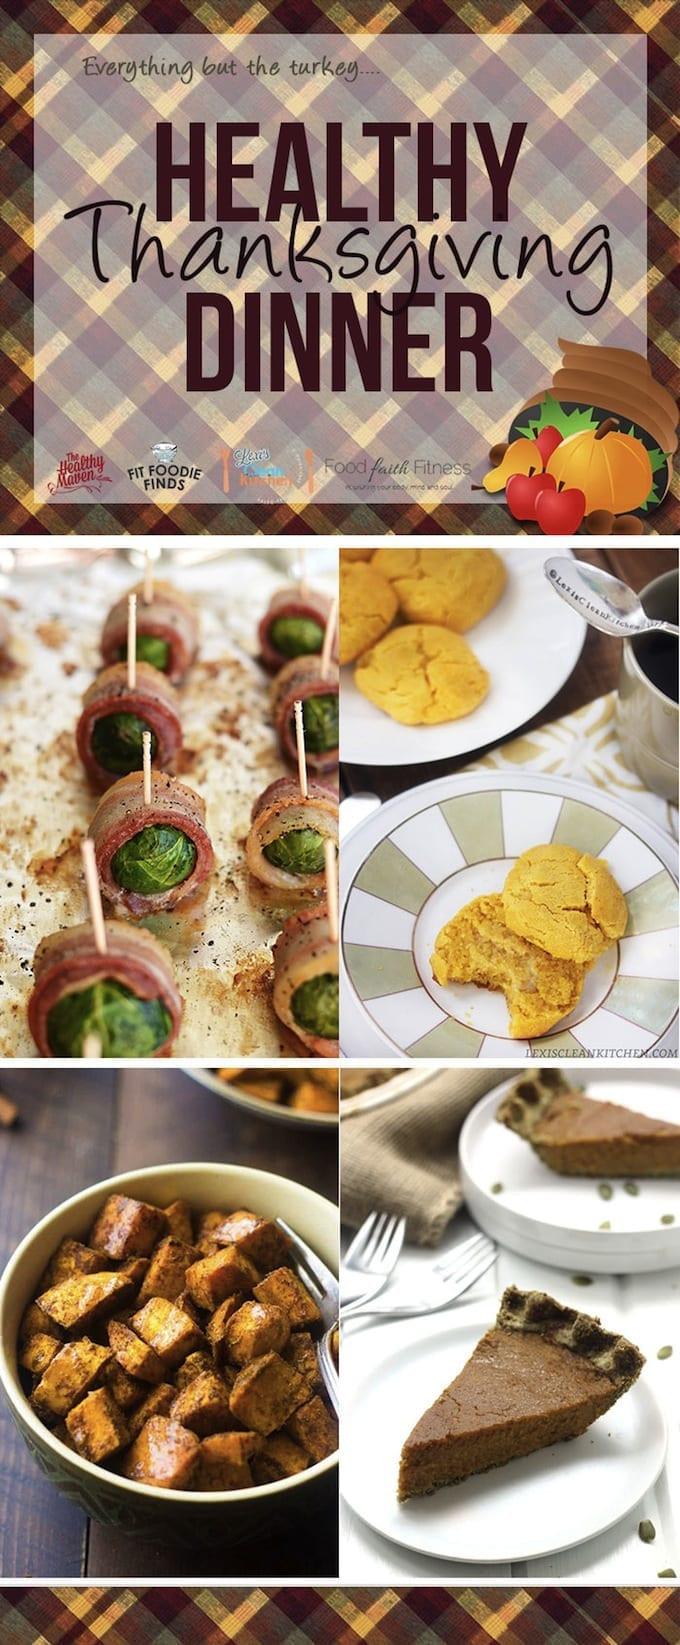 Healthy Thanksgiving Dinner  Paleo Pumpkin Pie in a Pumpkin Seed Crust A Healthy